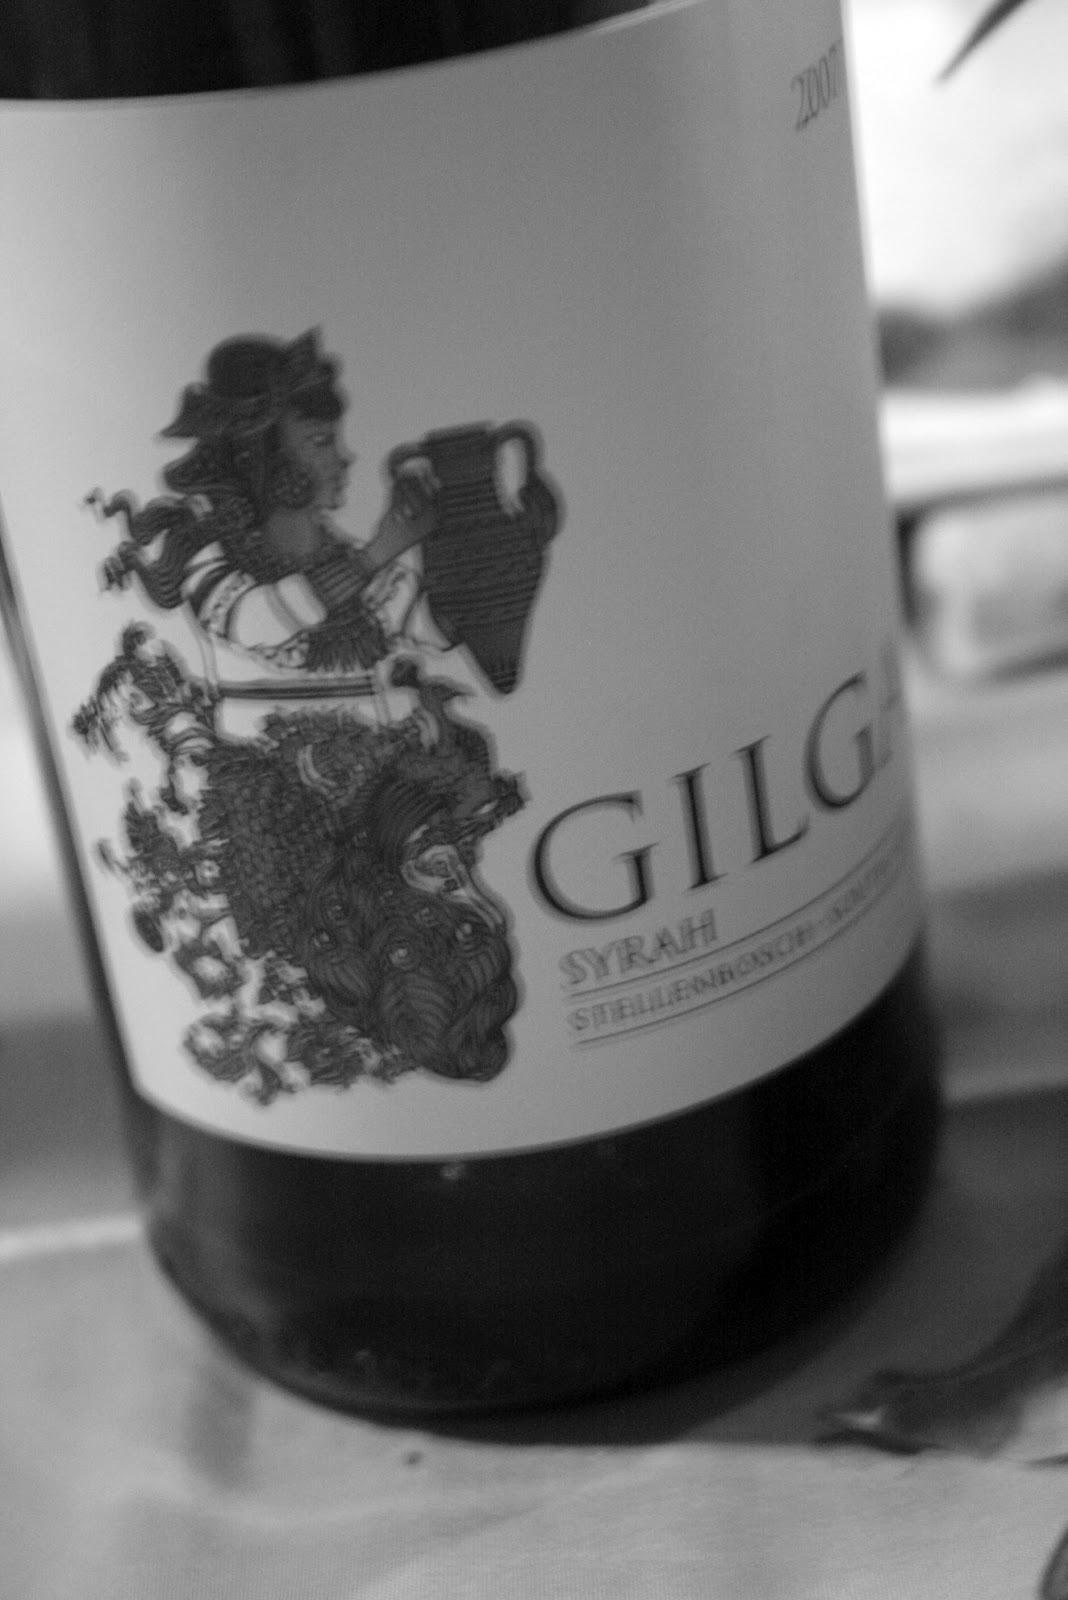 """Come Wine with us"" at Boer & Brit, Oude Wellington Estate | GILGA"